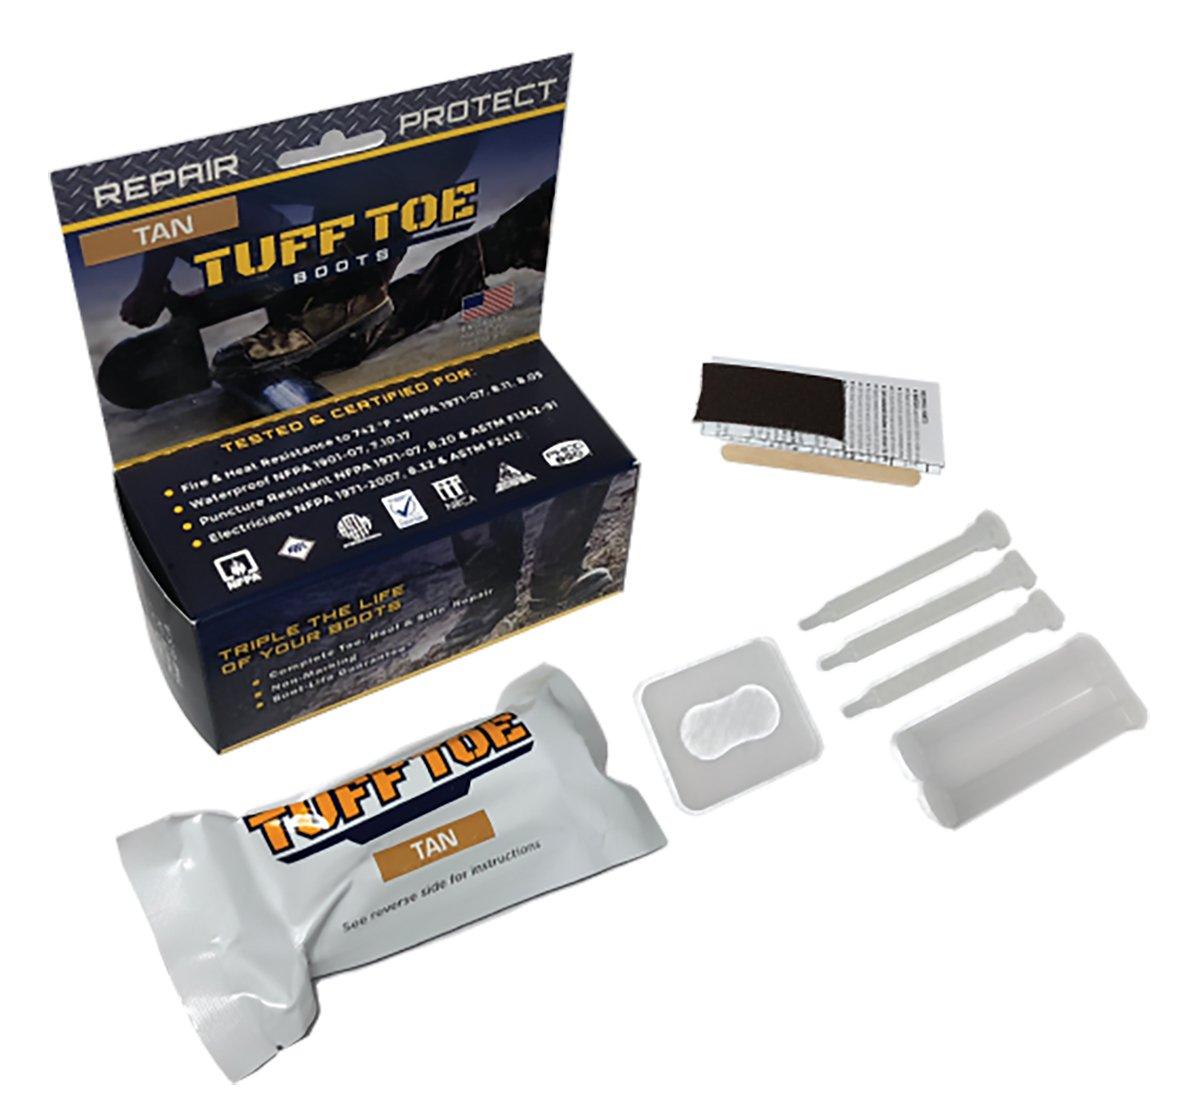 Tan- Tuff Toe Boot Guard Protection & Repair for Steel & Composite Safety Toe Boot Heel Guard & Work Shoe Repair